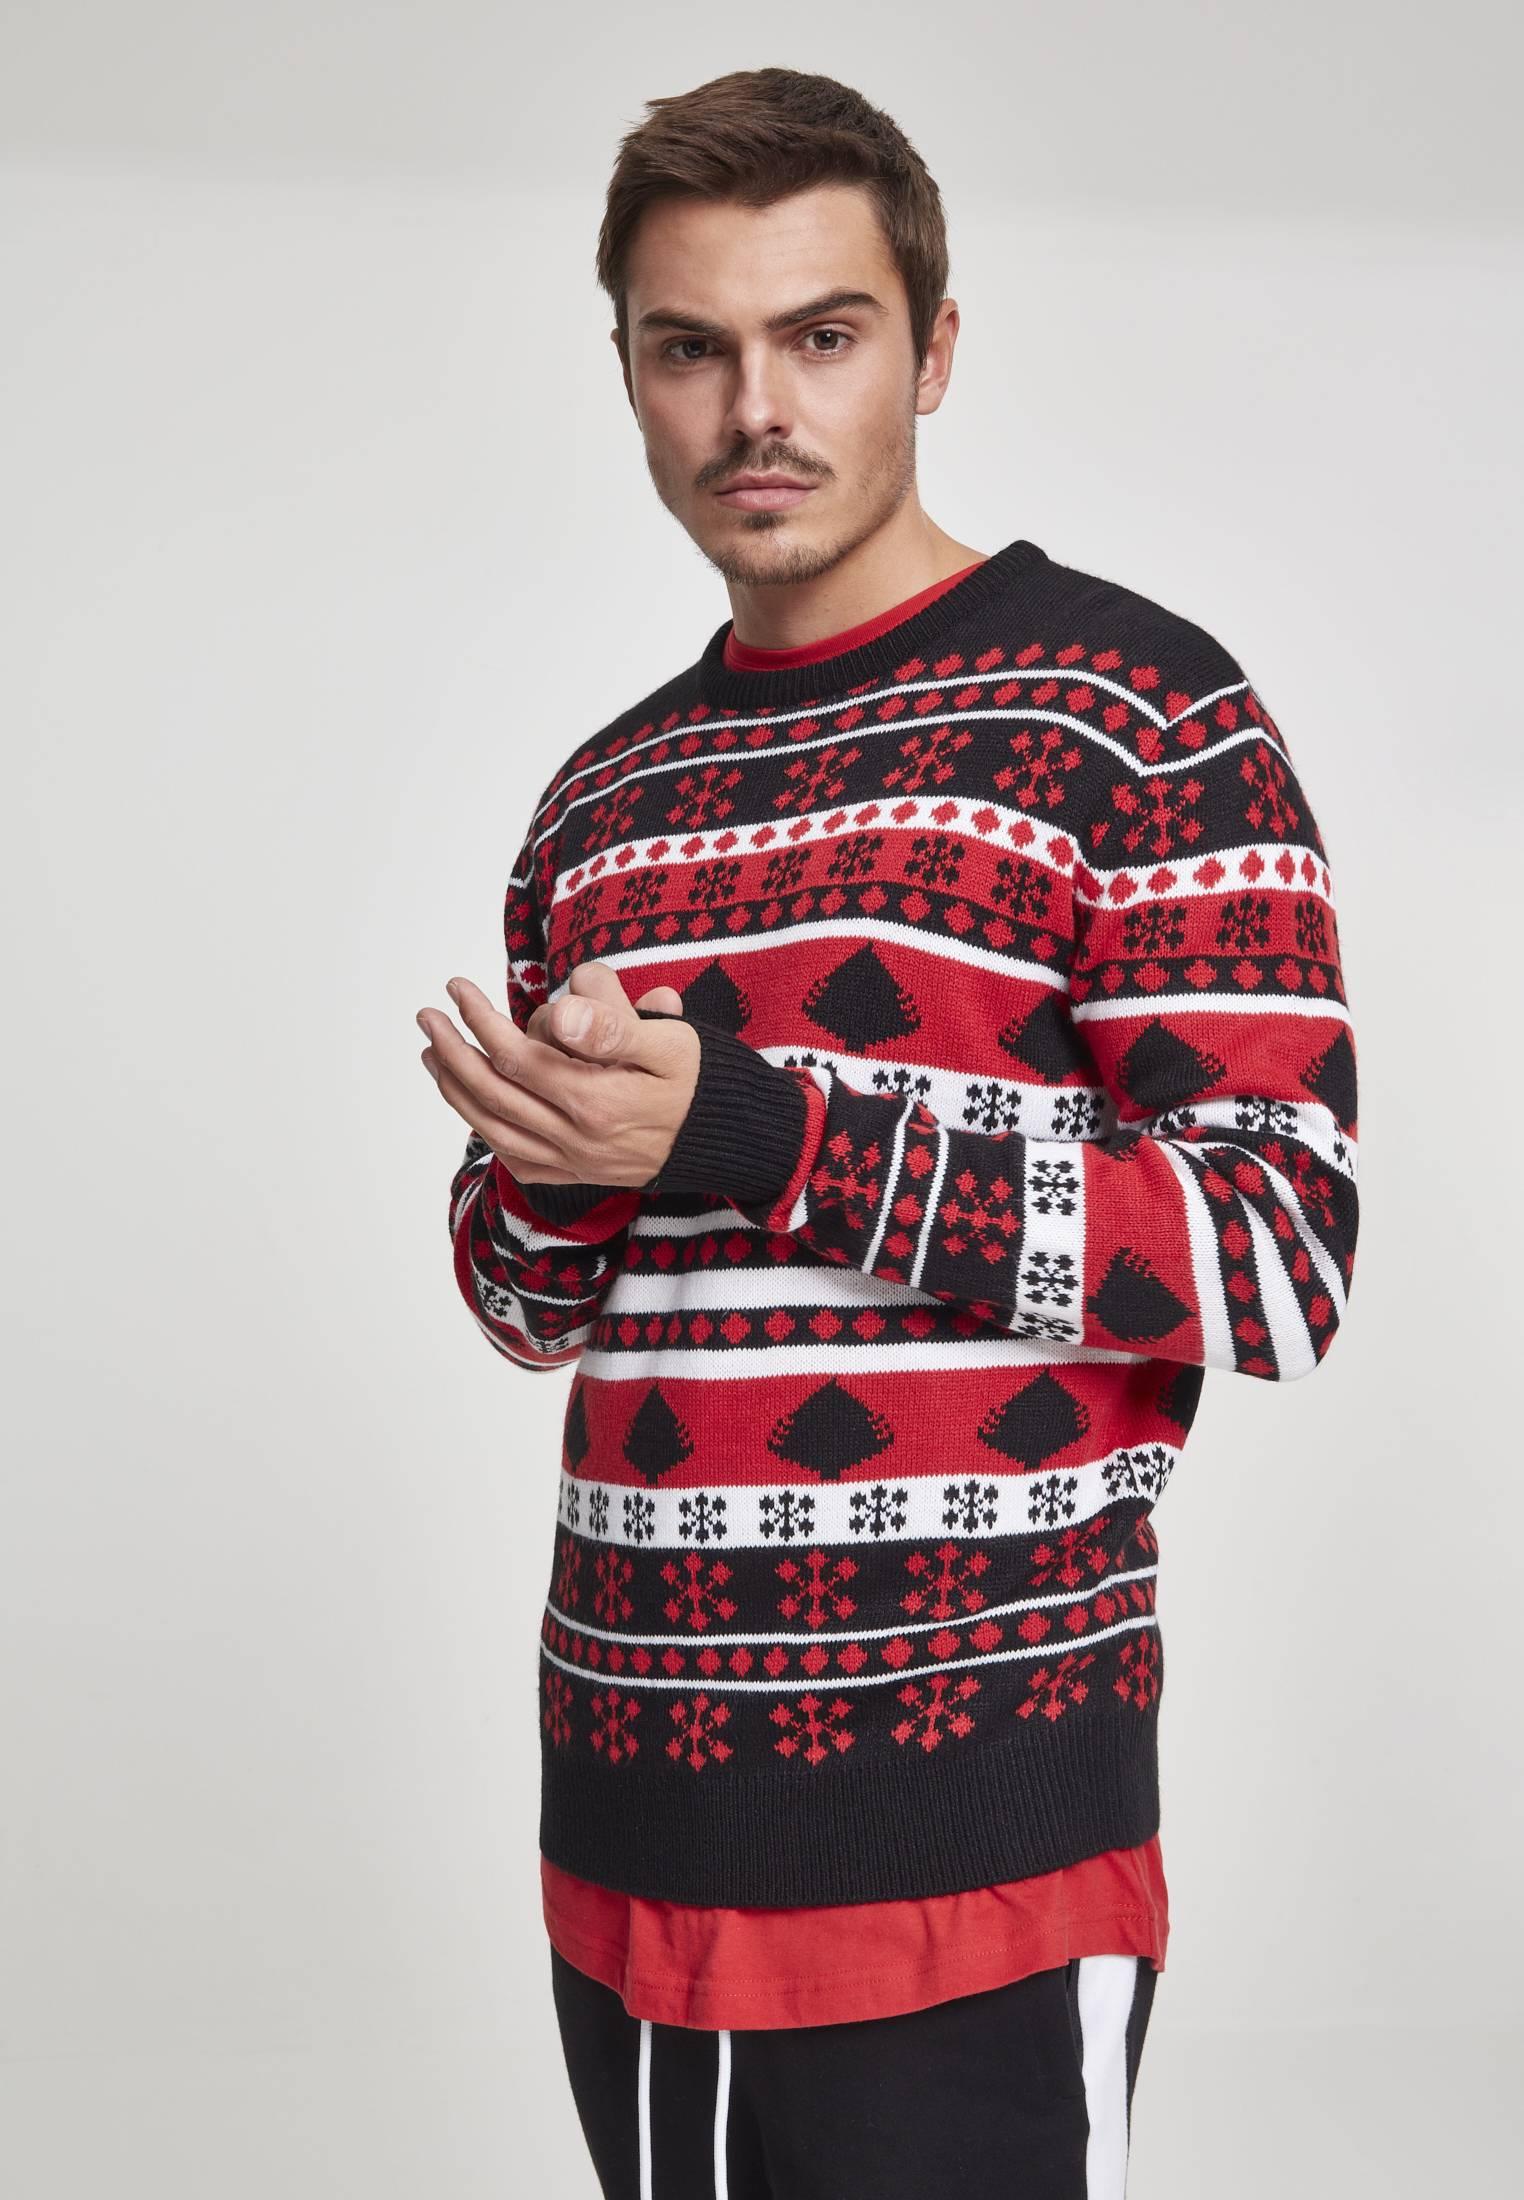 Urban Classics Snowflake Christmas Tree Sweater black/fire red/white - M